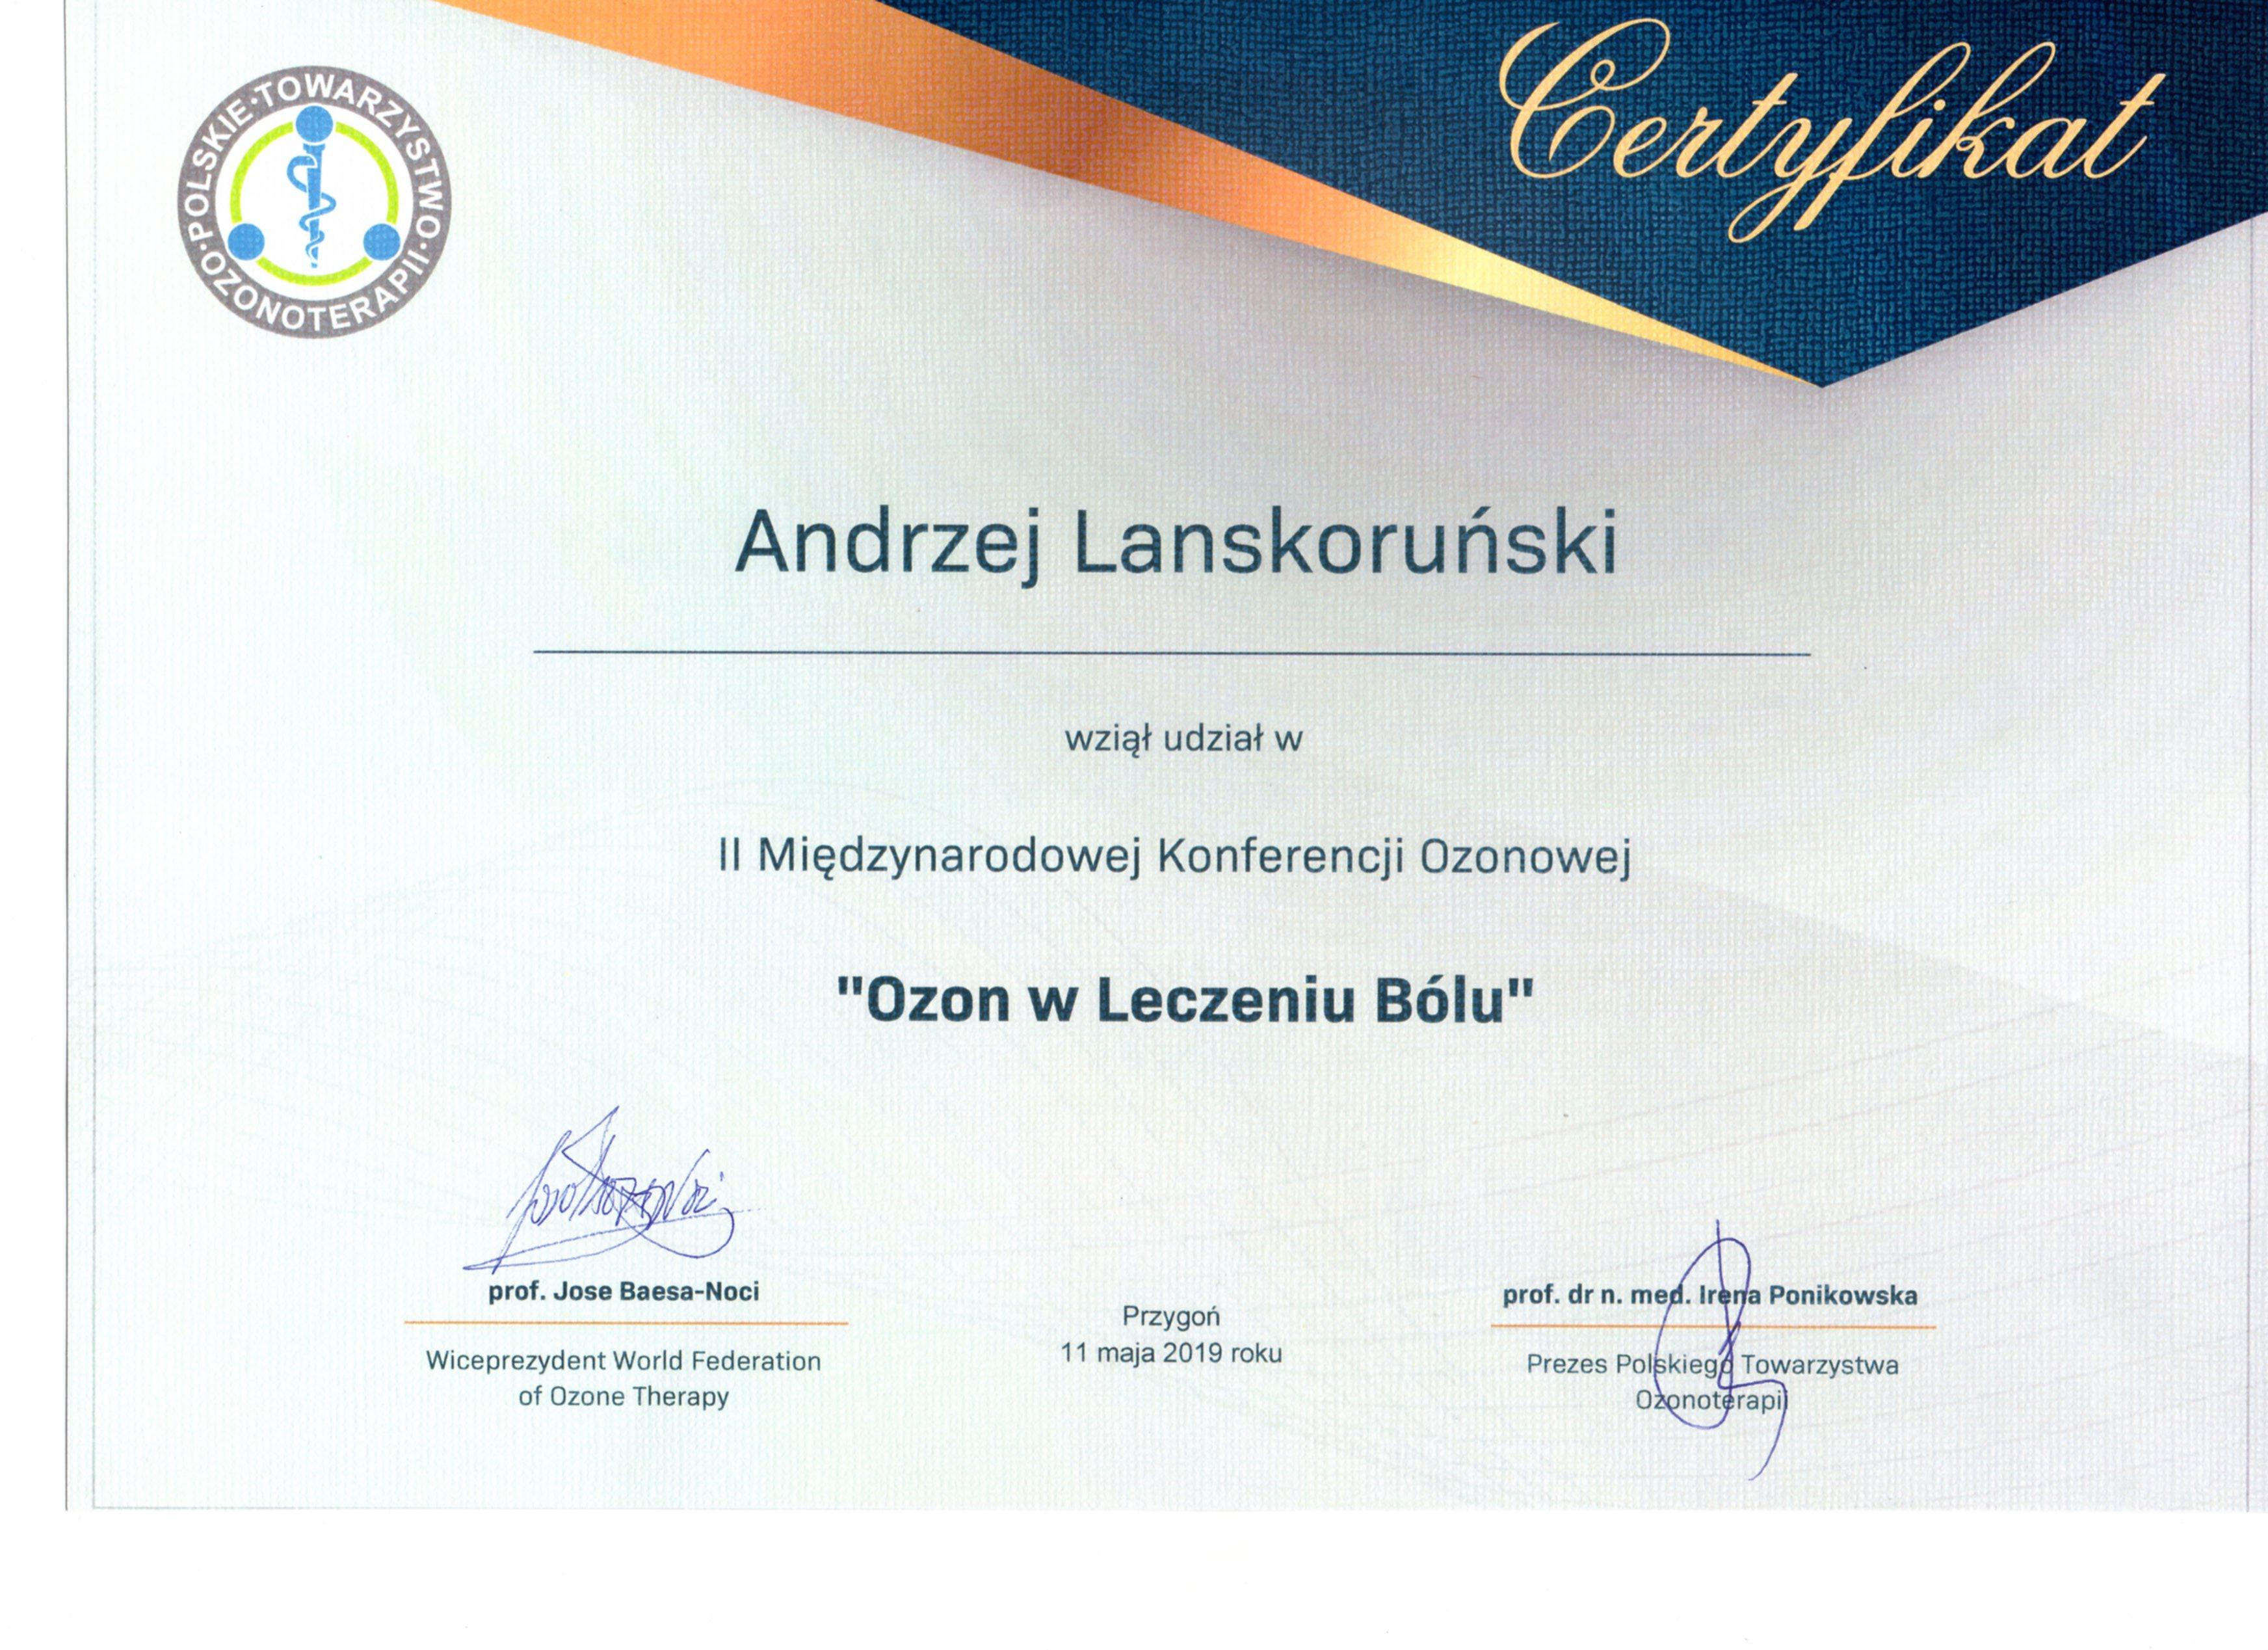 https://www.ozonoterapia.bydgoszcz.pl/wp-content/uploads/2019/08/img002-min.jpg